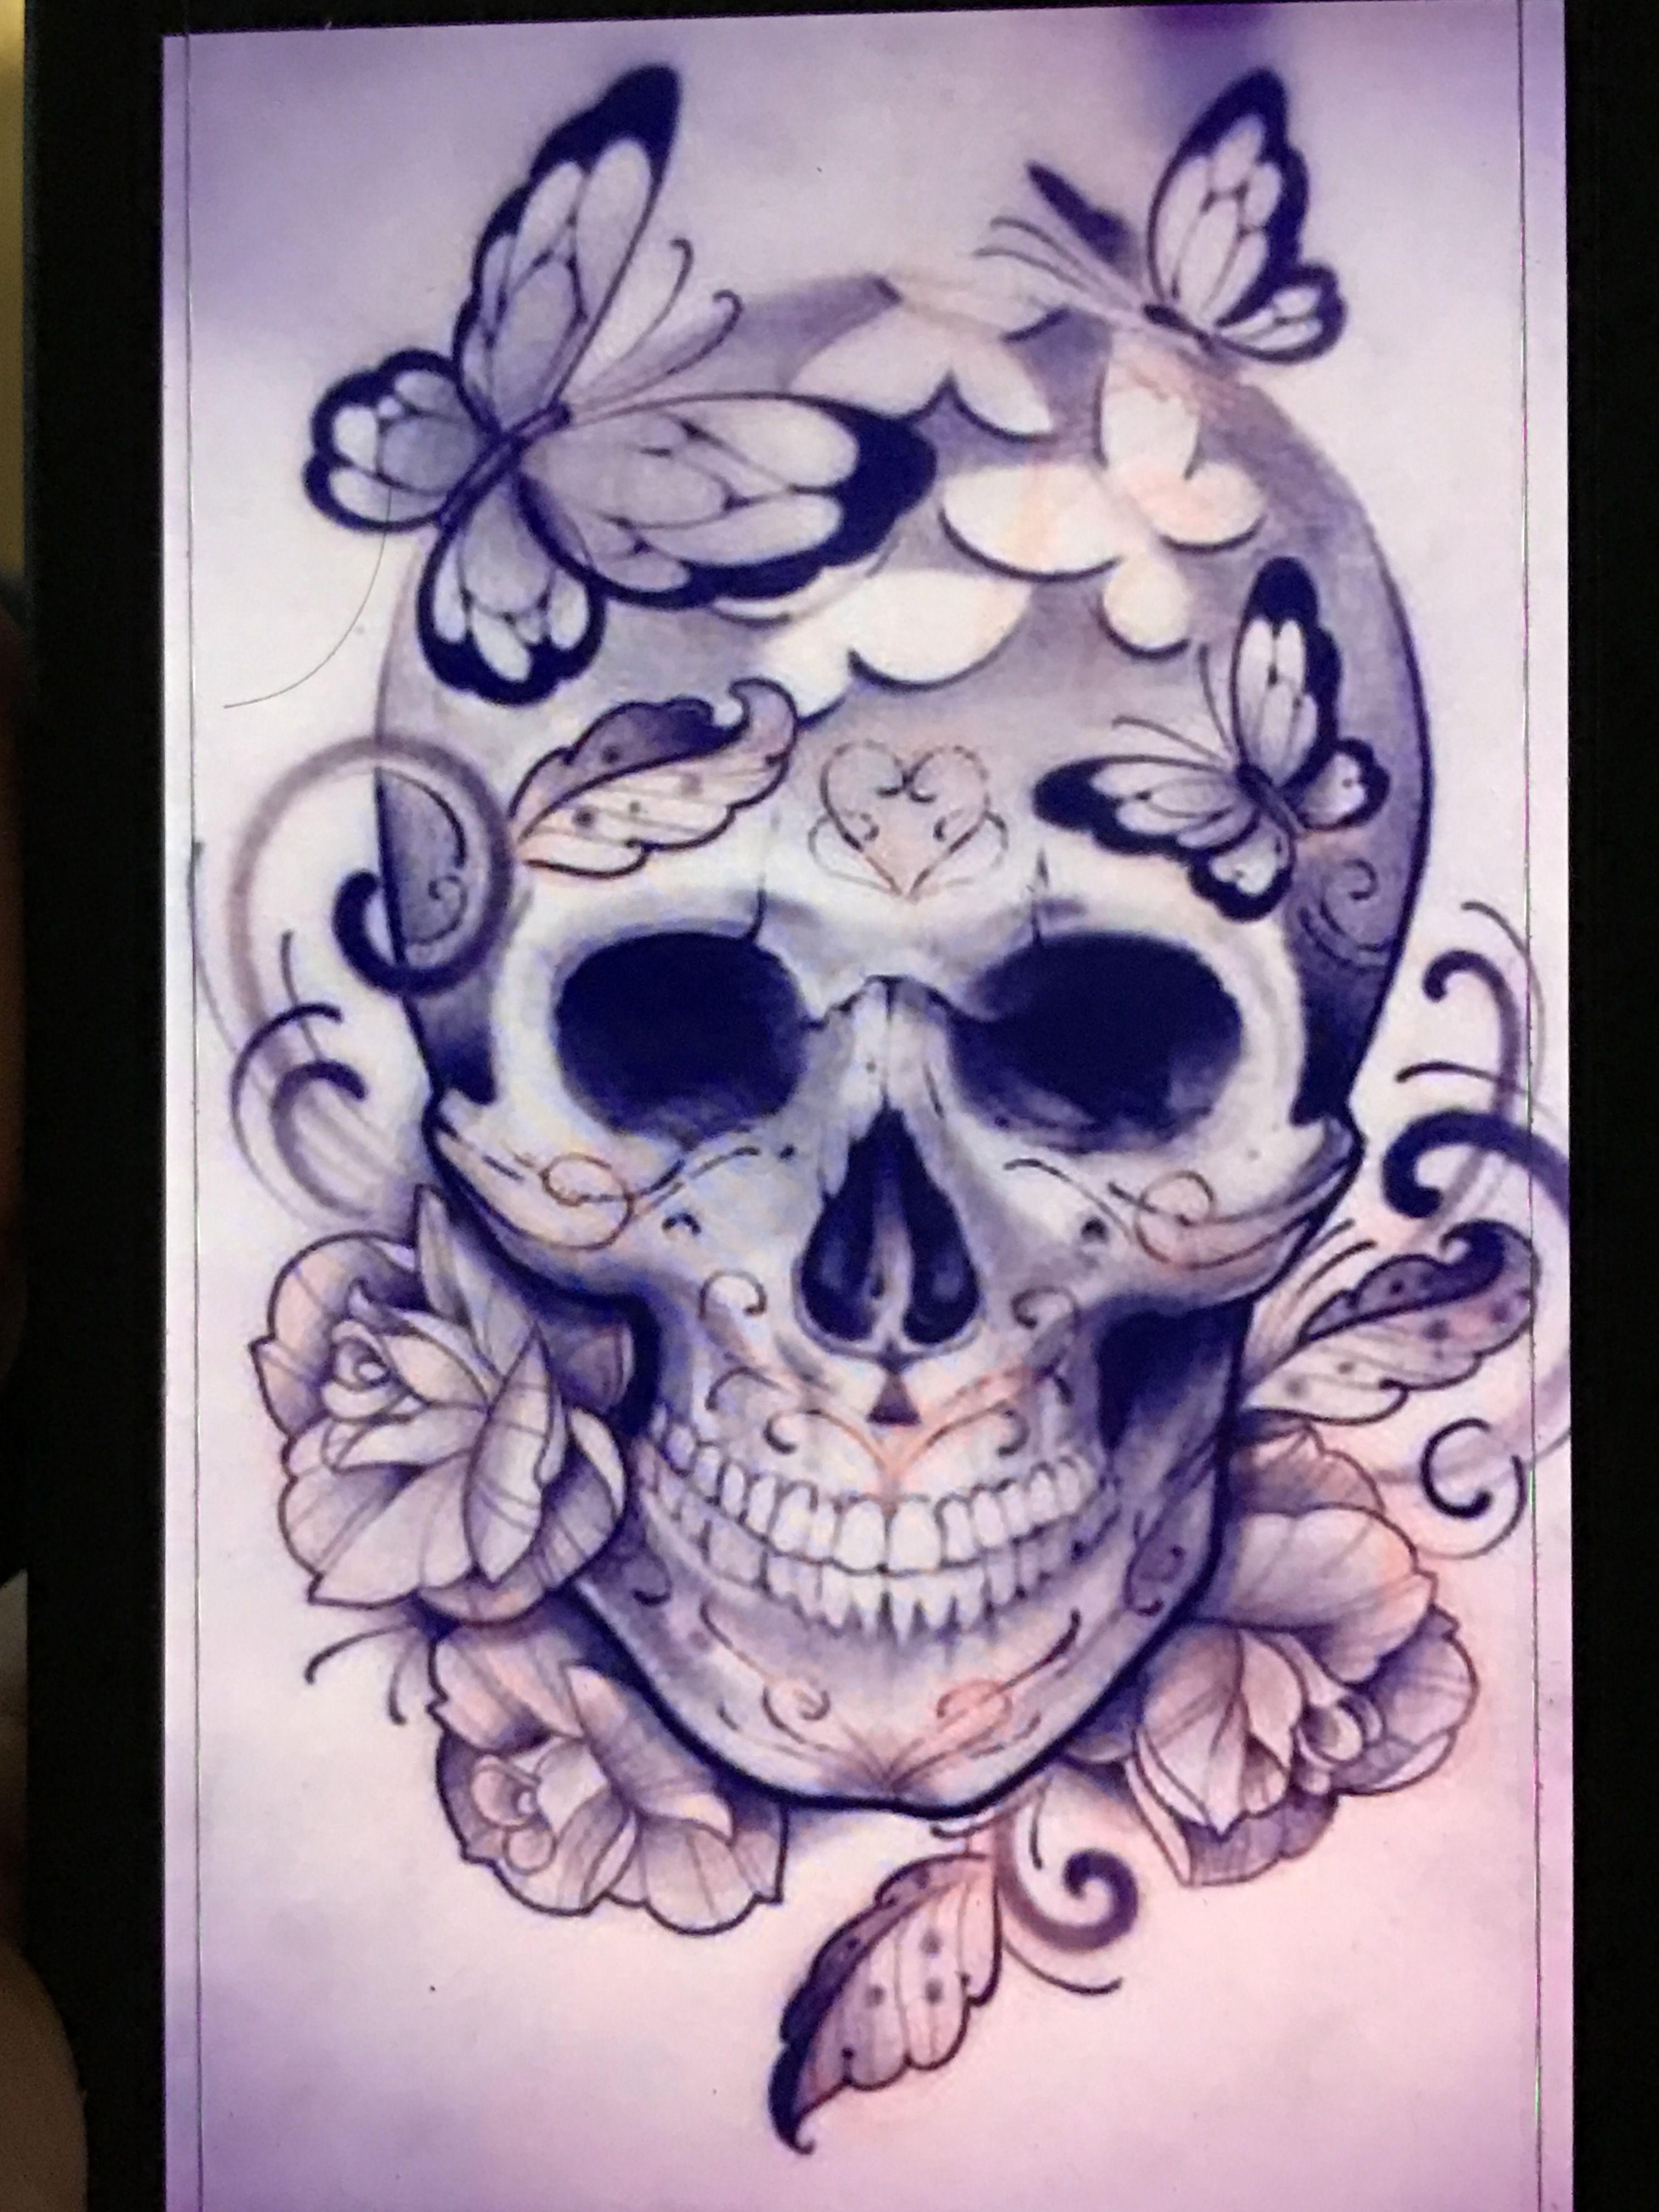 Pin by Amylyn CarterBesse on Tattoos Feminine skull